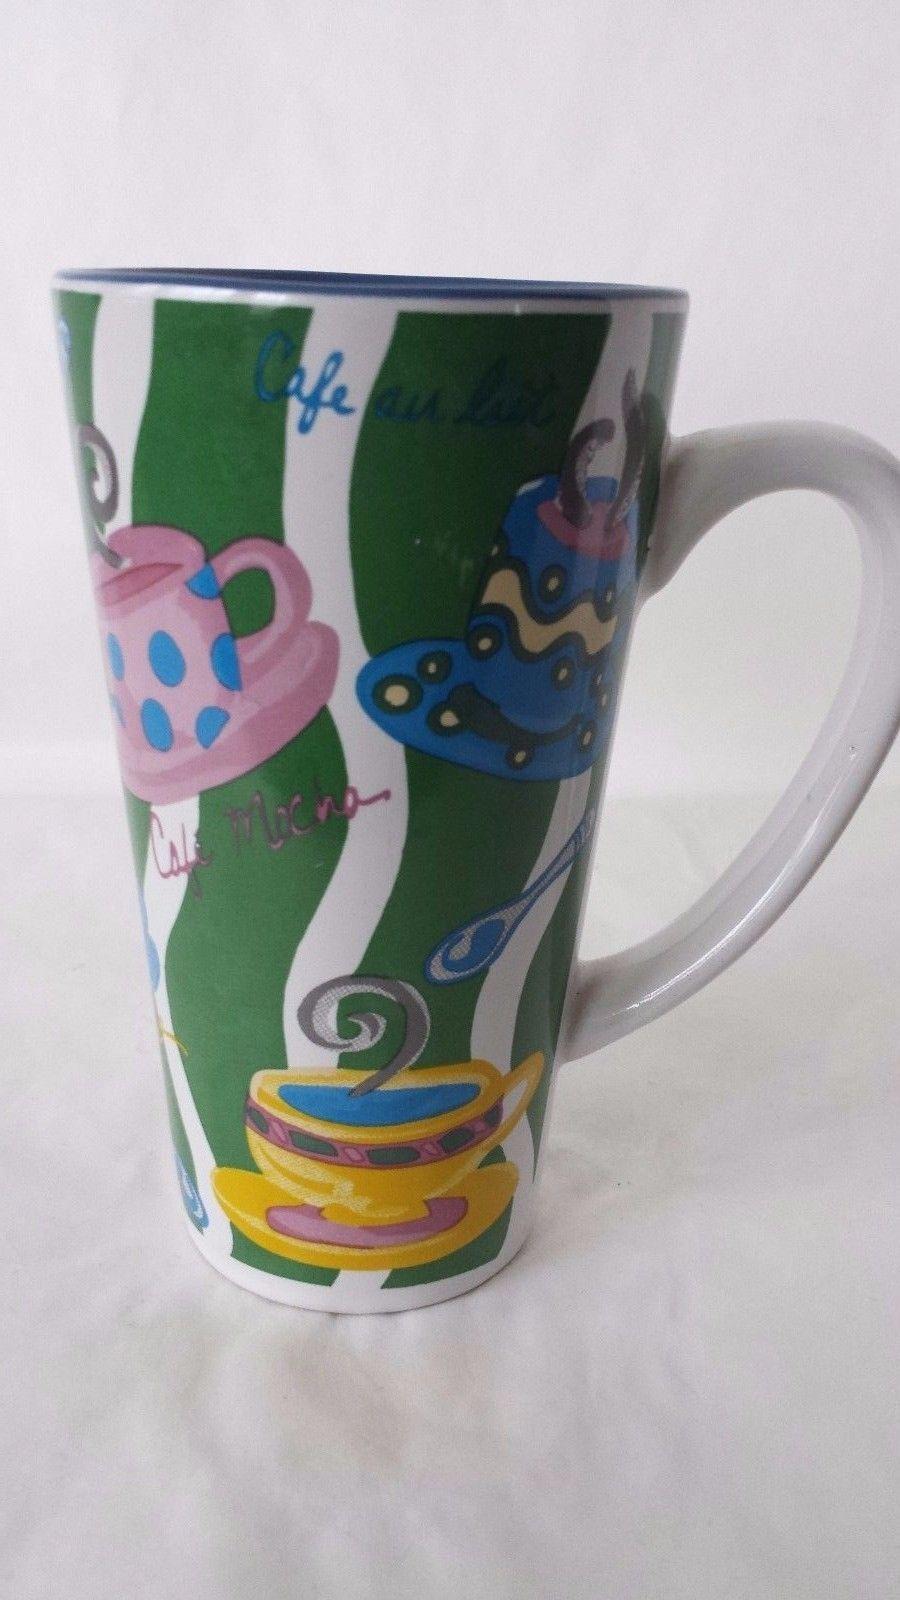 Latte Coffee Houston Harvest Coffee Tea Mug Cup  Green Blue - $12.46